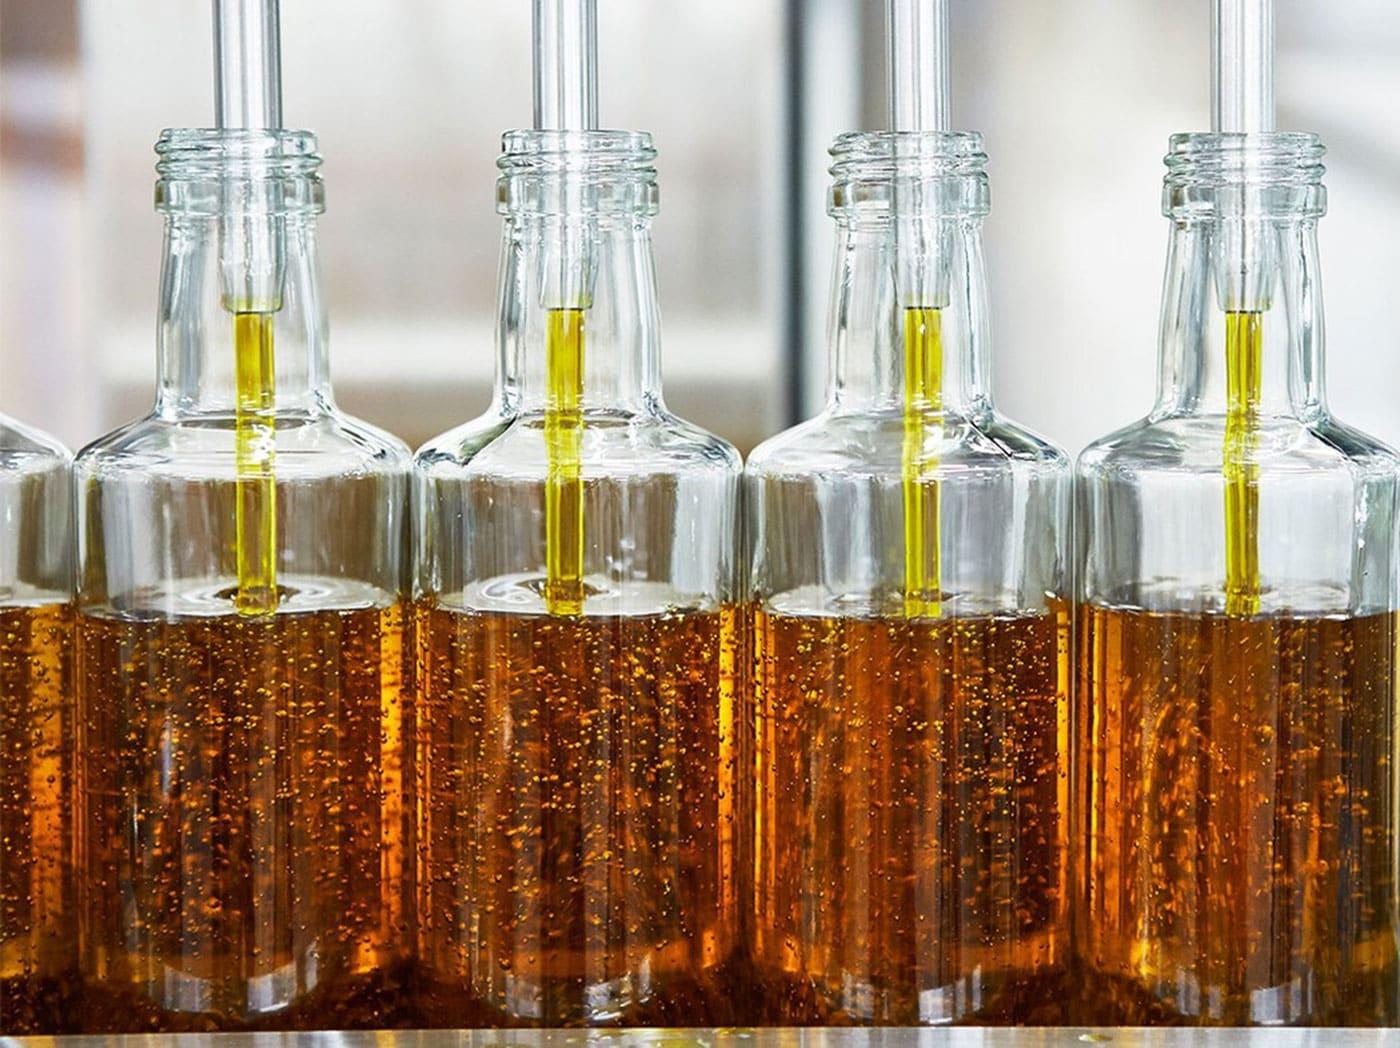 Sklenené fľaše s organickým repkovým olejom IKEA SMAKRIK.